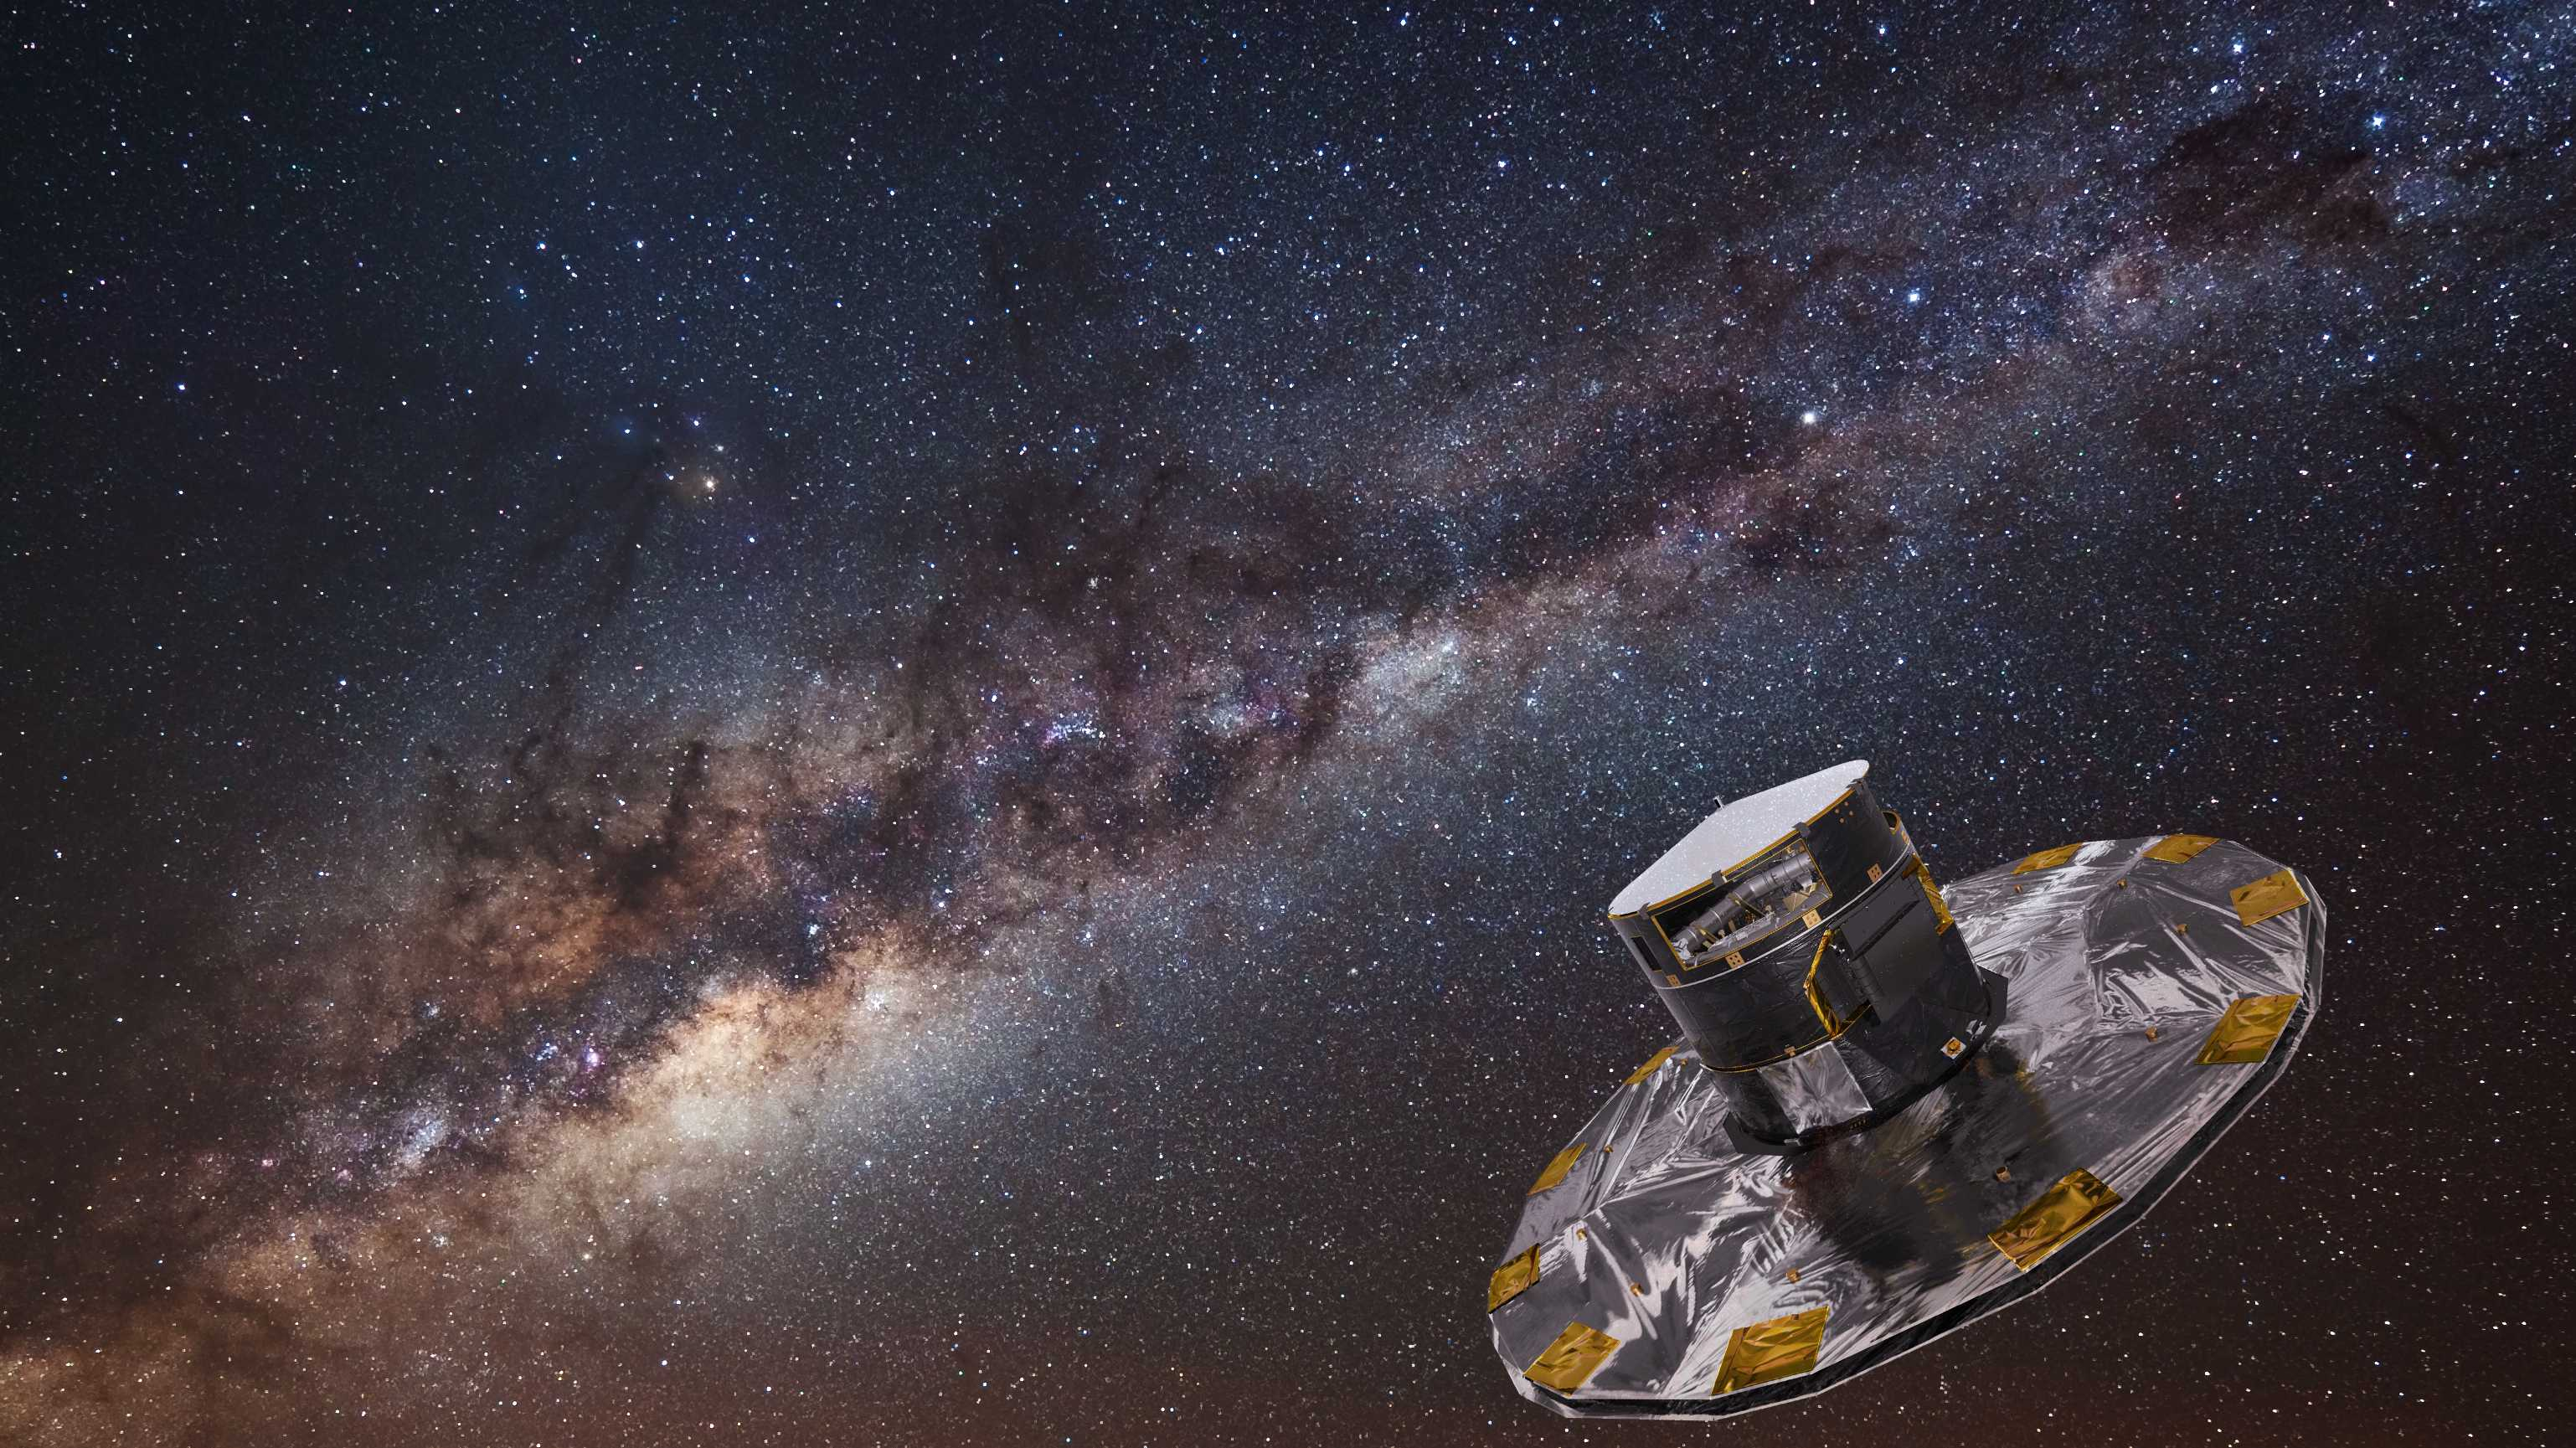 ESA-Weltraumteleskop Gaia: Korrektur-Manöver hält Sonde aus dem Erdschatten